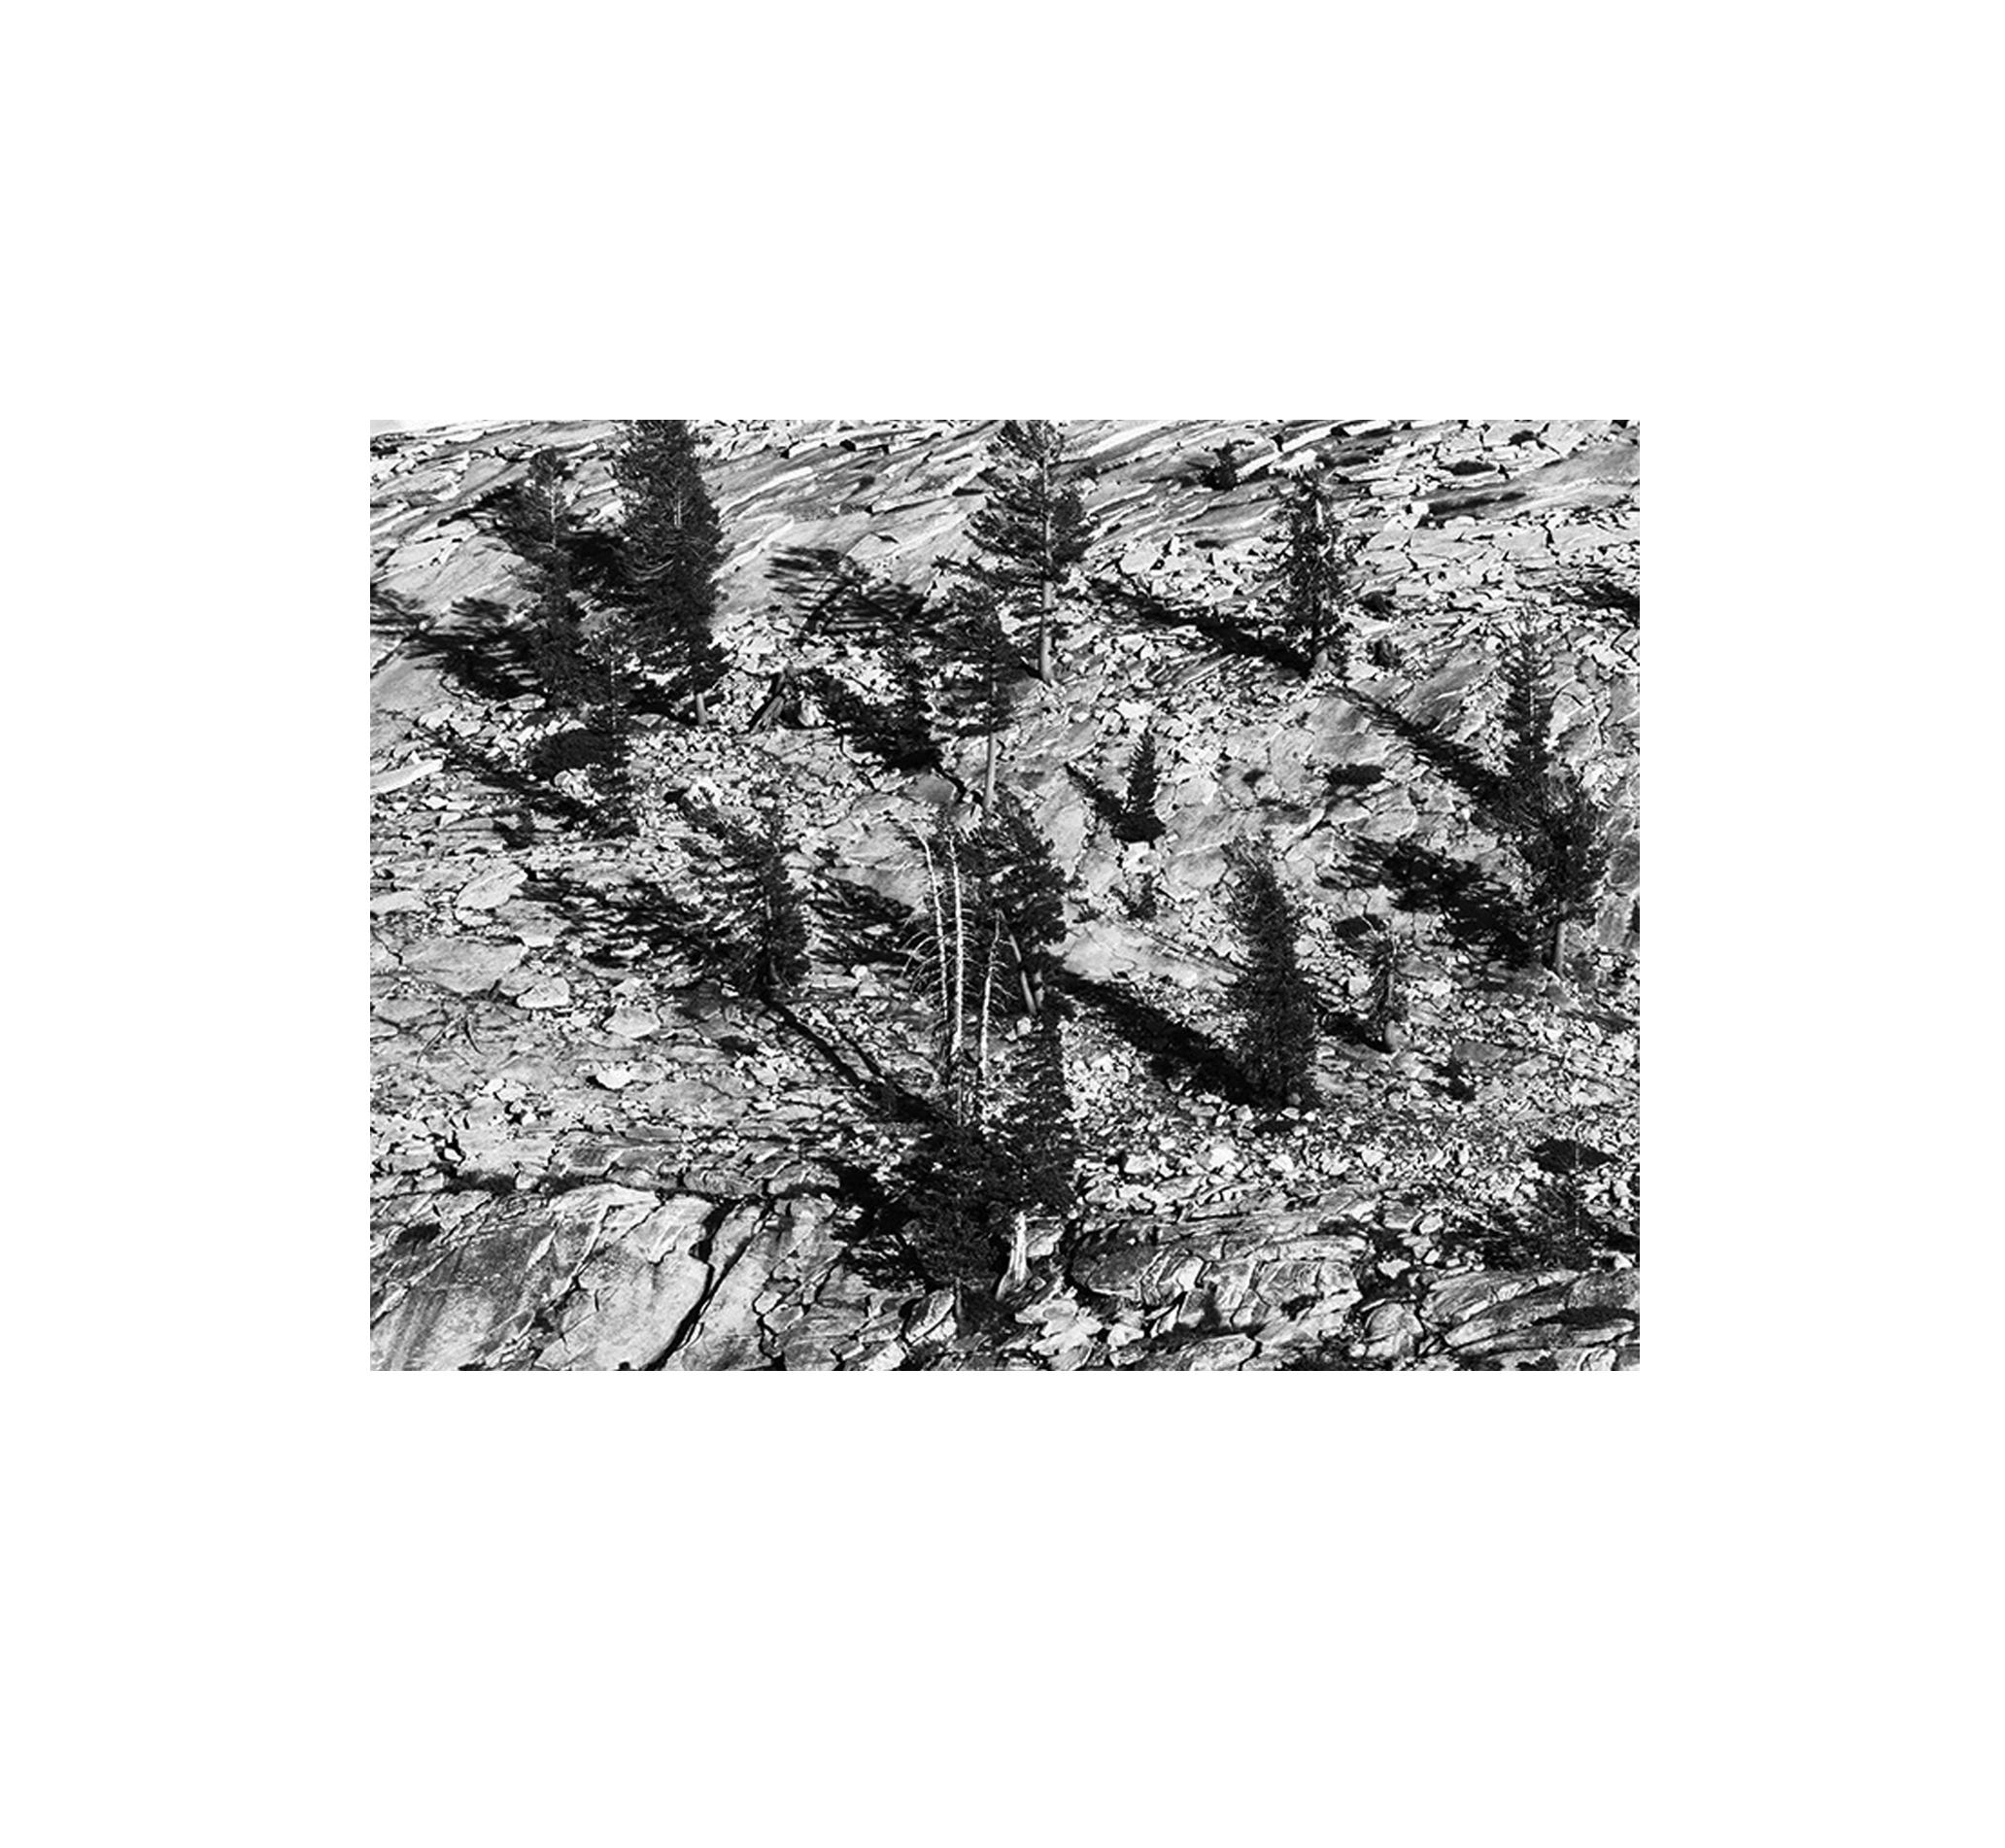 Hillside Patterns